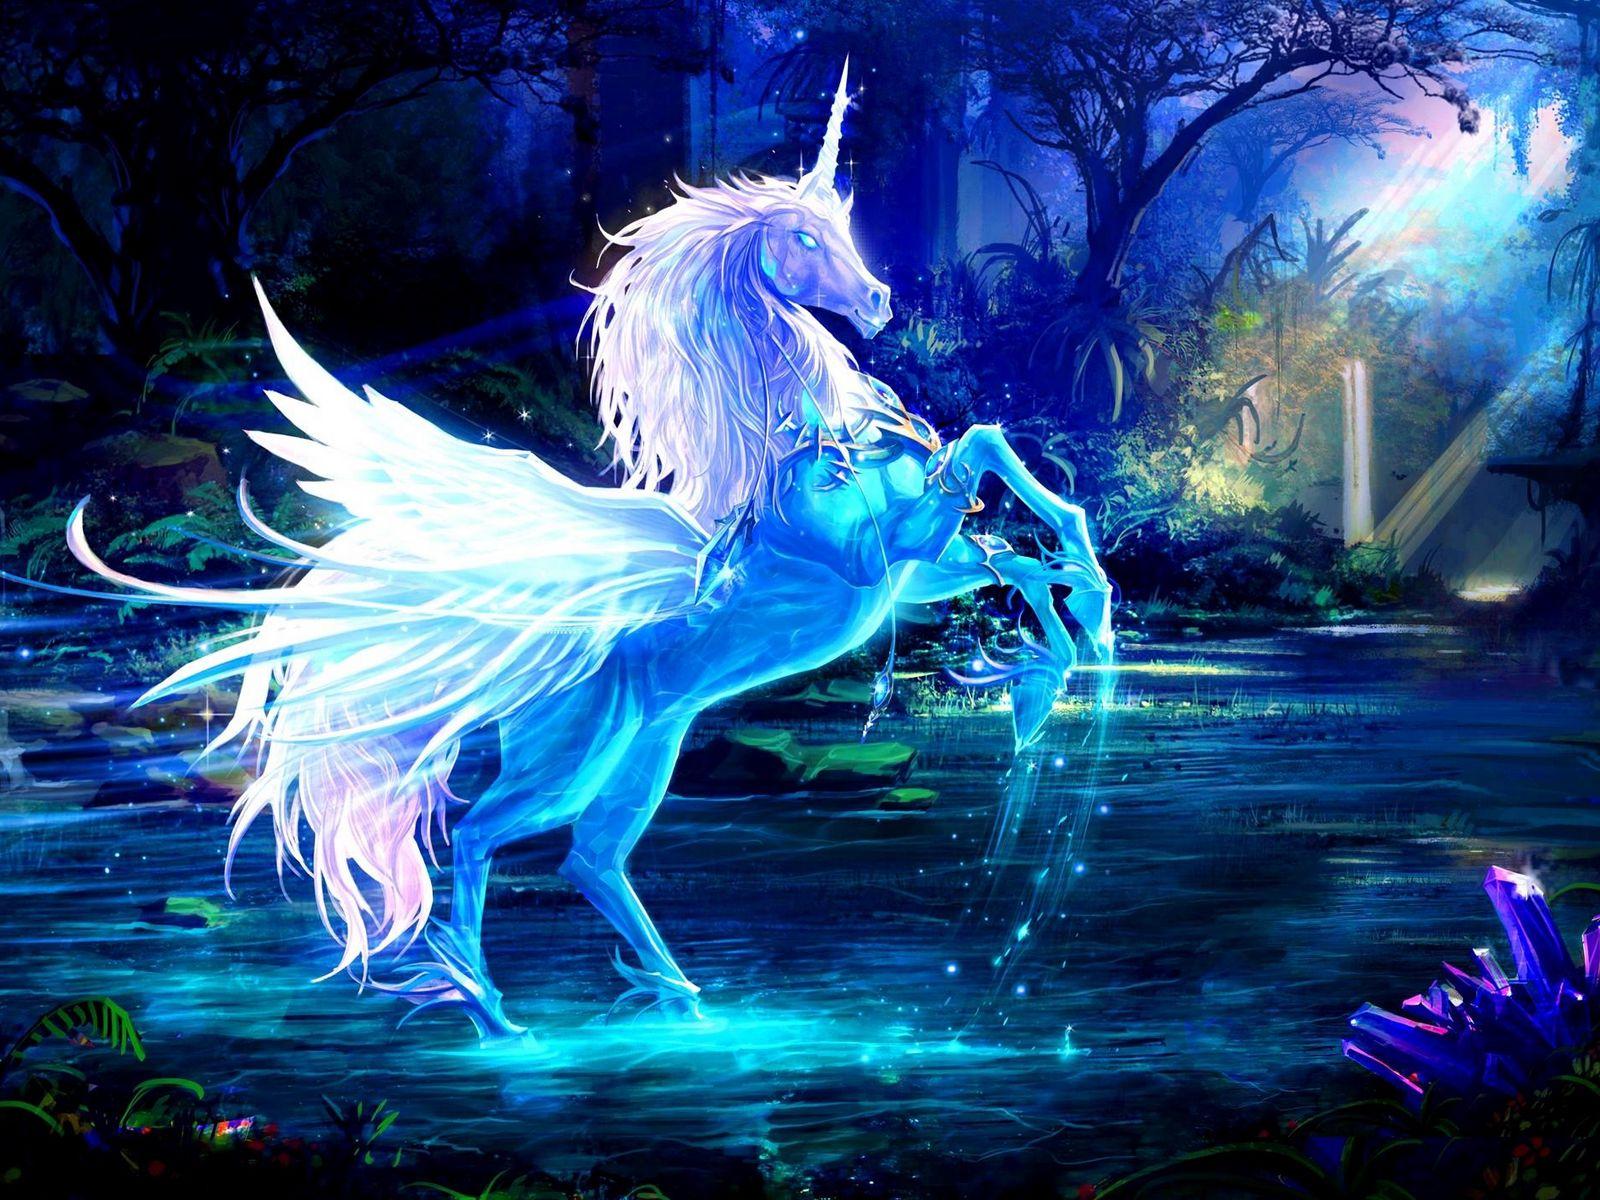 1600x1200 Wallpaper unicorn, water, forest, night, magic